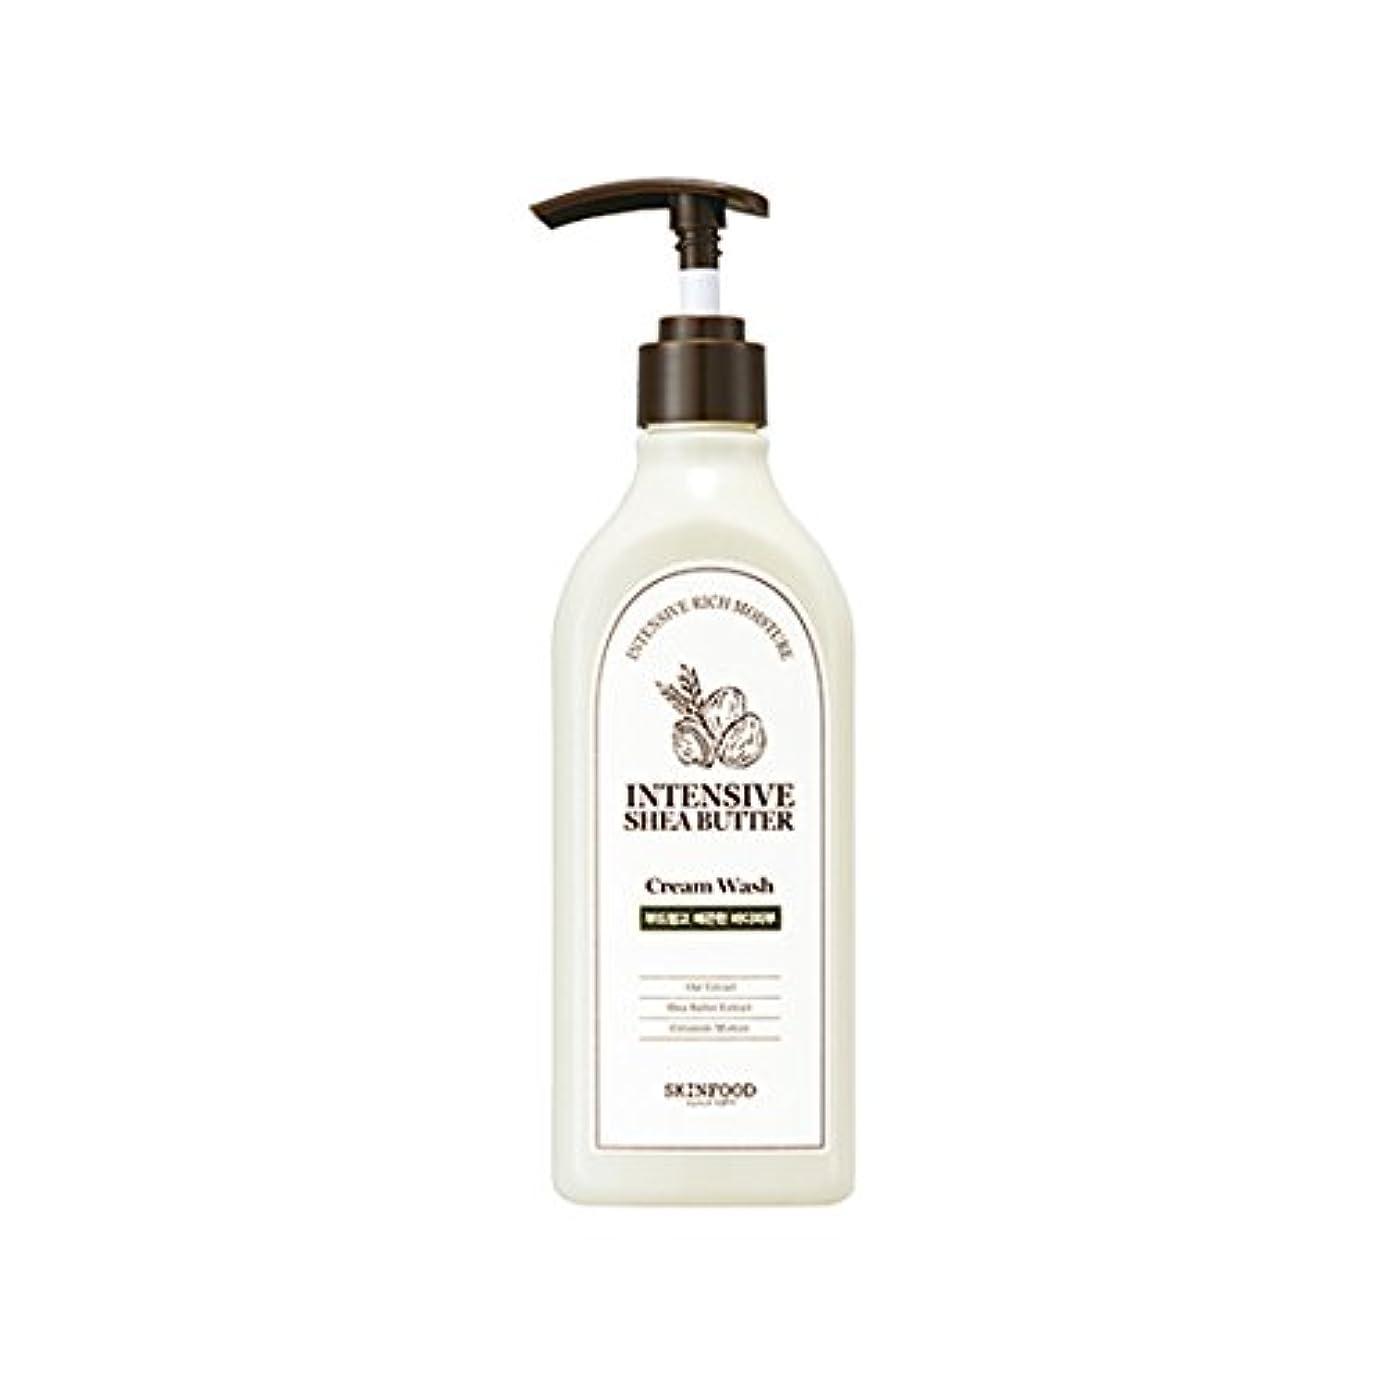 [New] SKINFOOD Intensive Shea Butter Cream Wash 335ml/スキンフード インテンシブ シア バター クリーム ウォッシュ 335ml [並行輸入品]